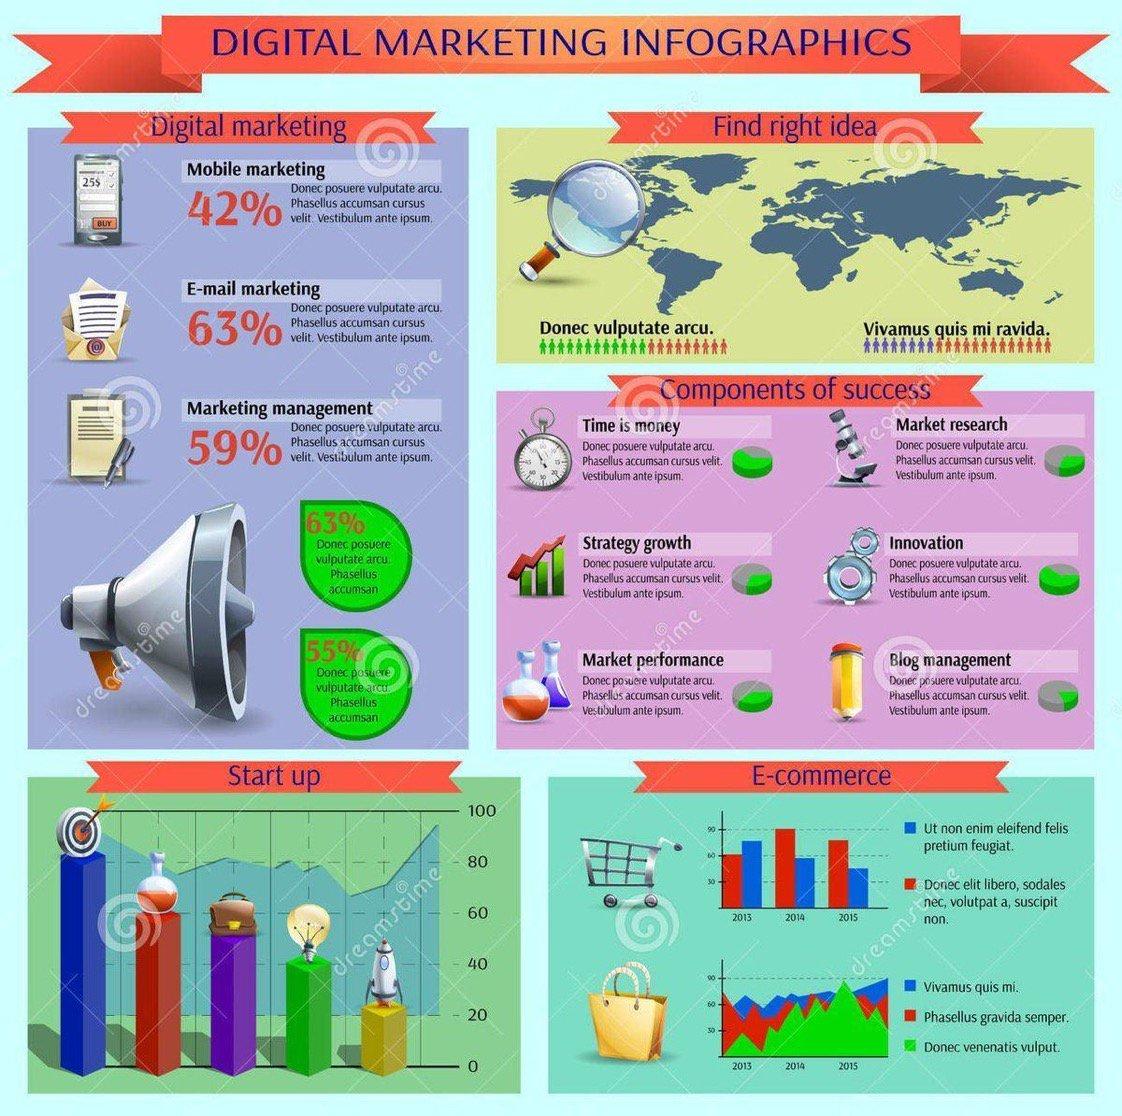 [ #DigitalMarketing] #infographic Key Secrets for #Digital #Marketing #Startups #eCommerce #SEO #GrowthHacking  #Cloud #Al #IoT #CX #VR #UX <br>http://pic.twitter.com/YTPRZBzvFL